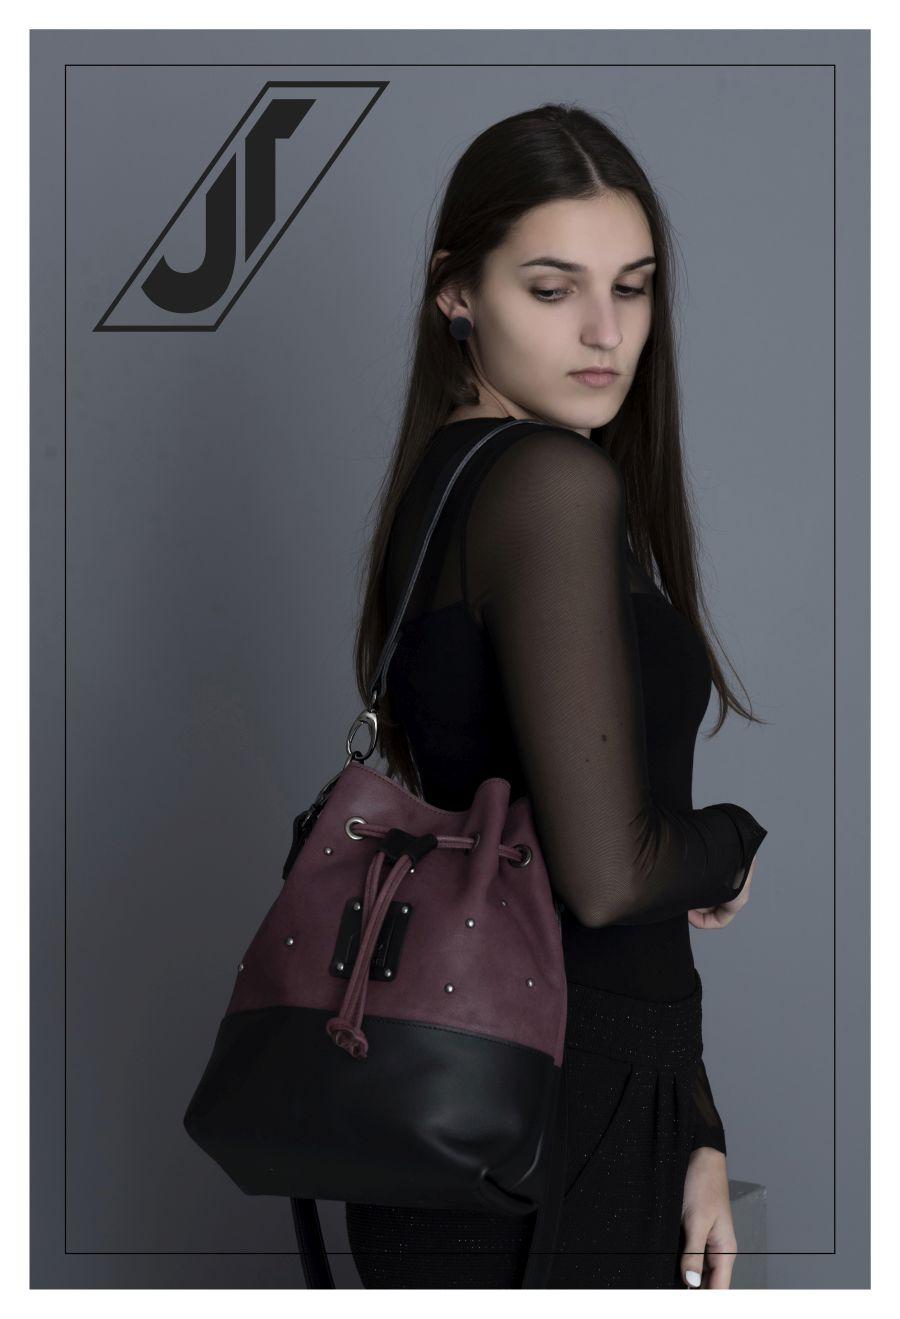 13 - Jaana Trauss Design käsitööna valmivad nahkkotid ja -ehted